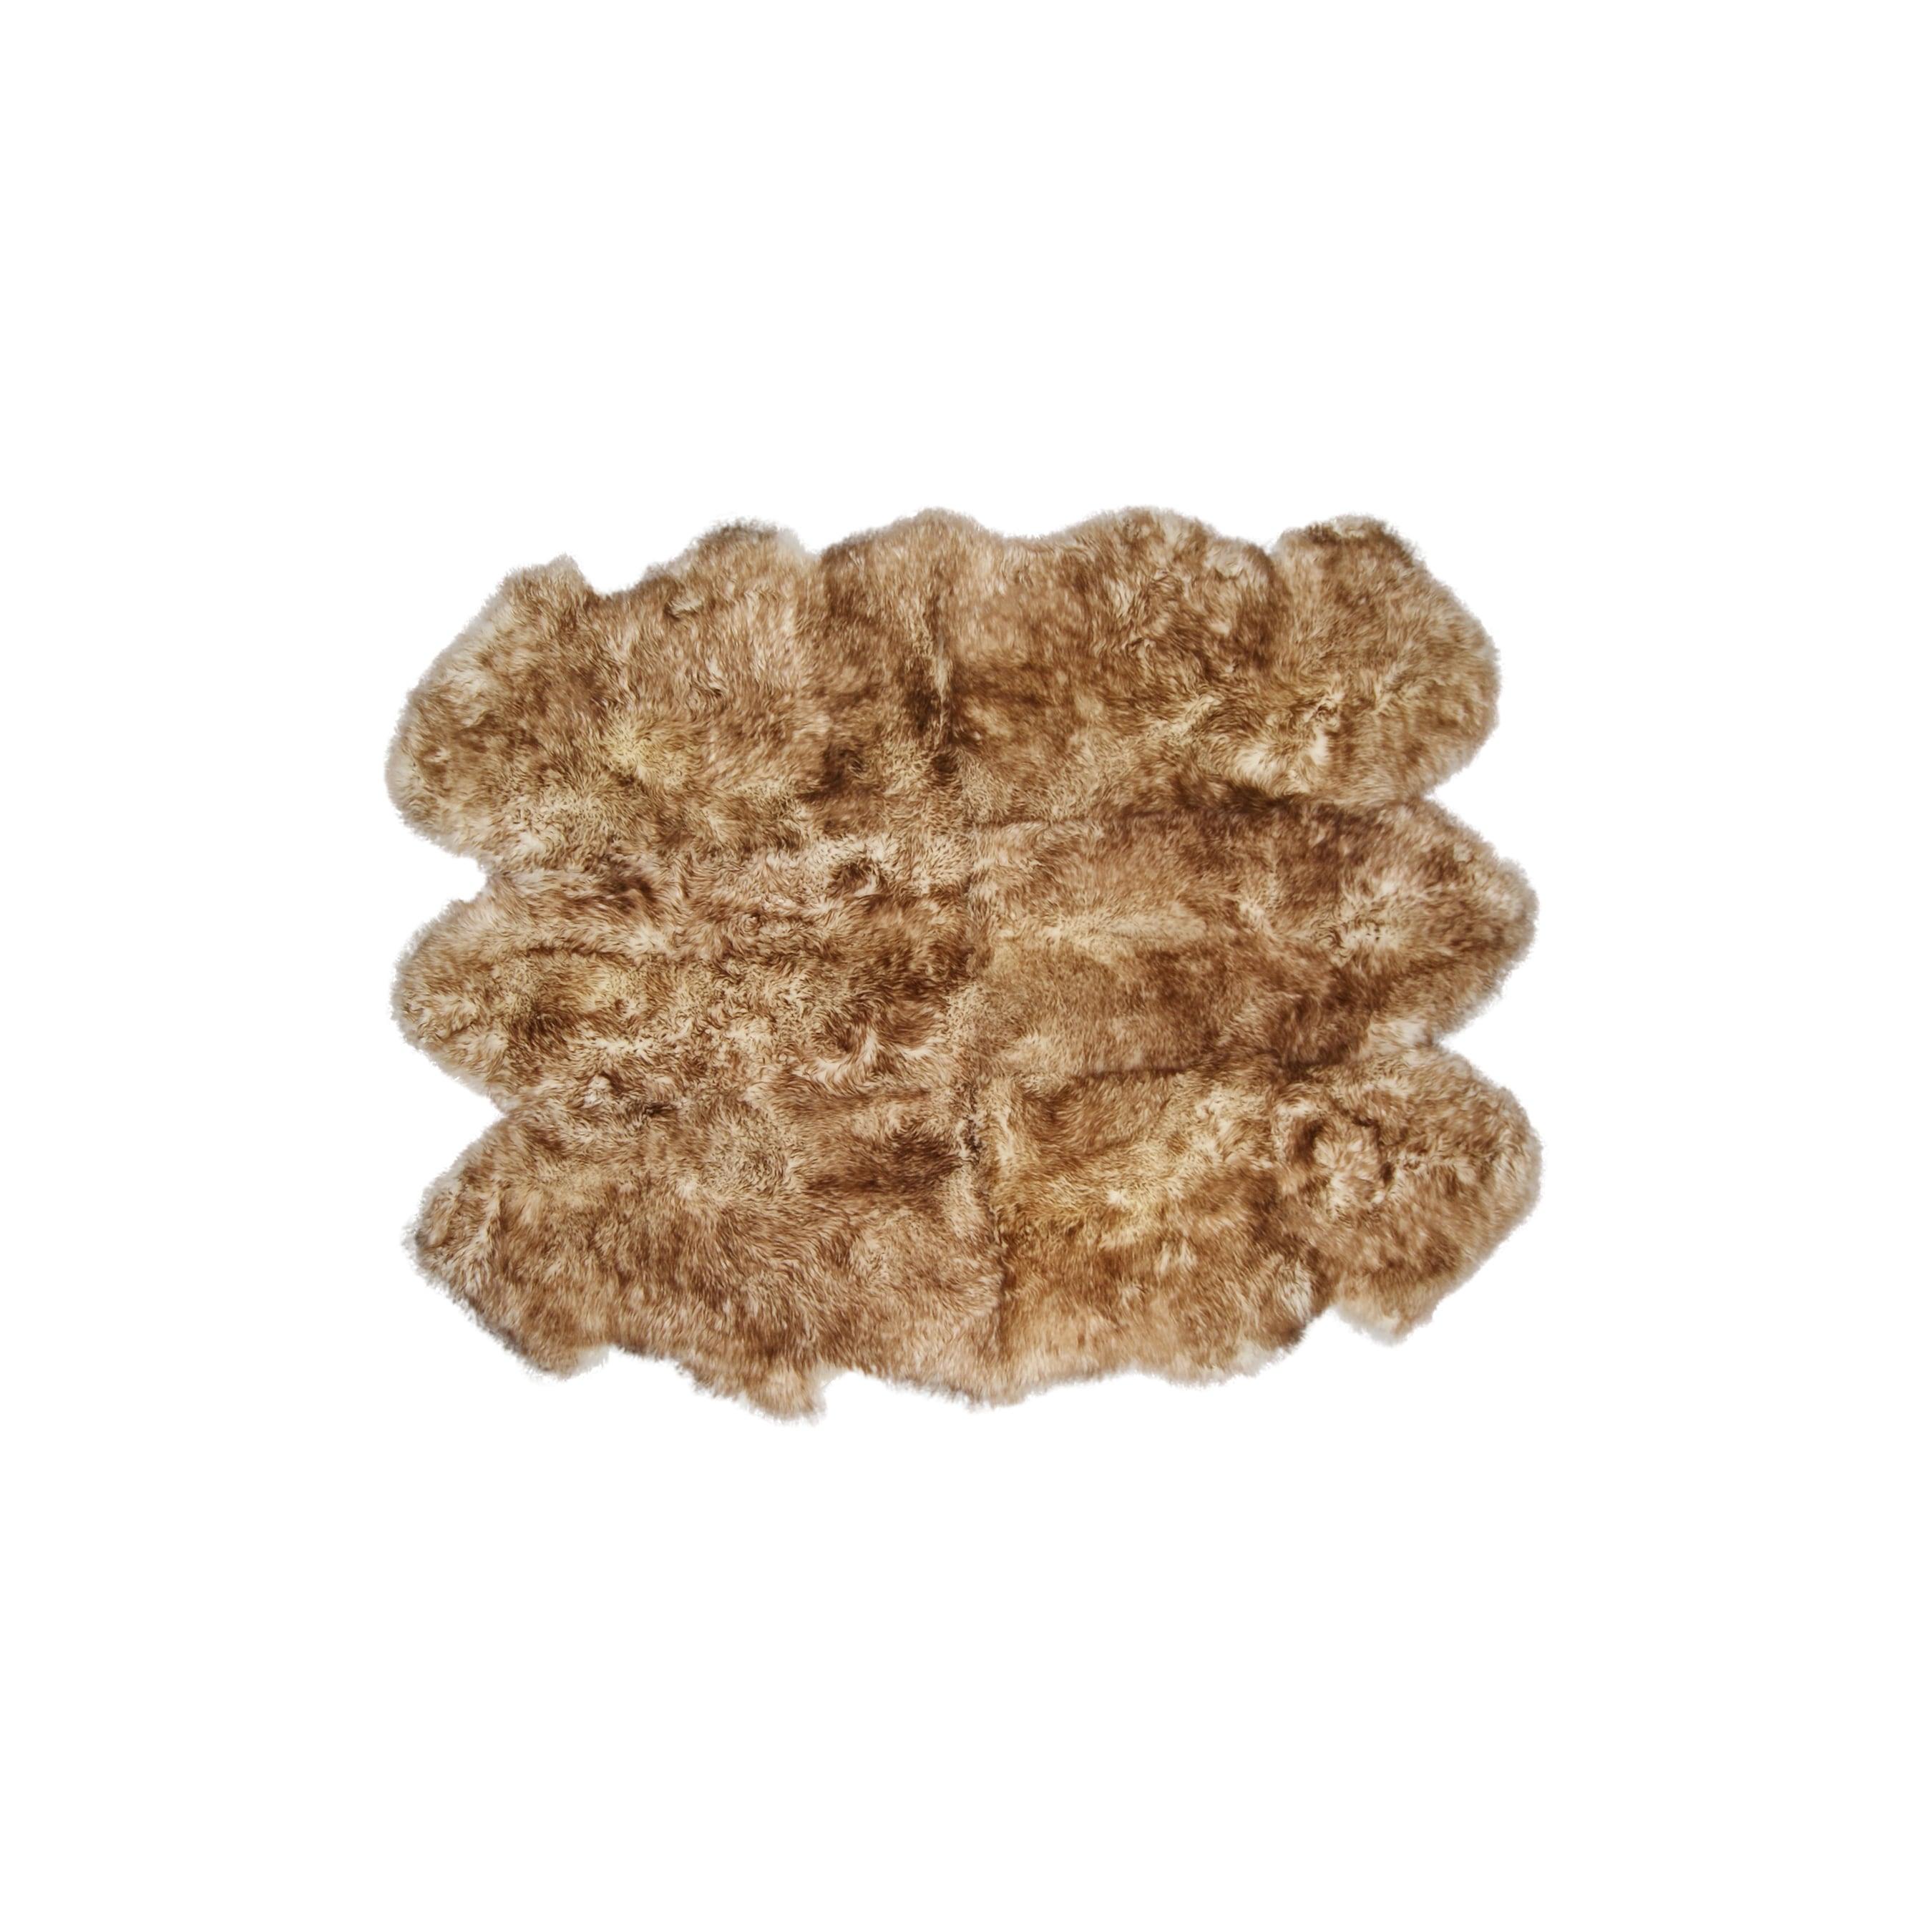 Sheepskin Grant Chocolate Rug